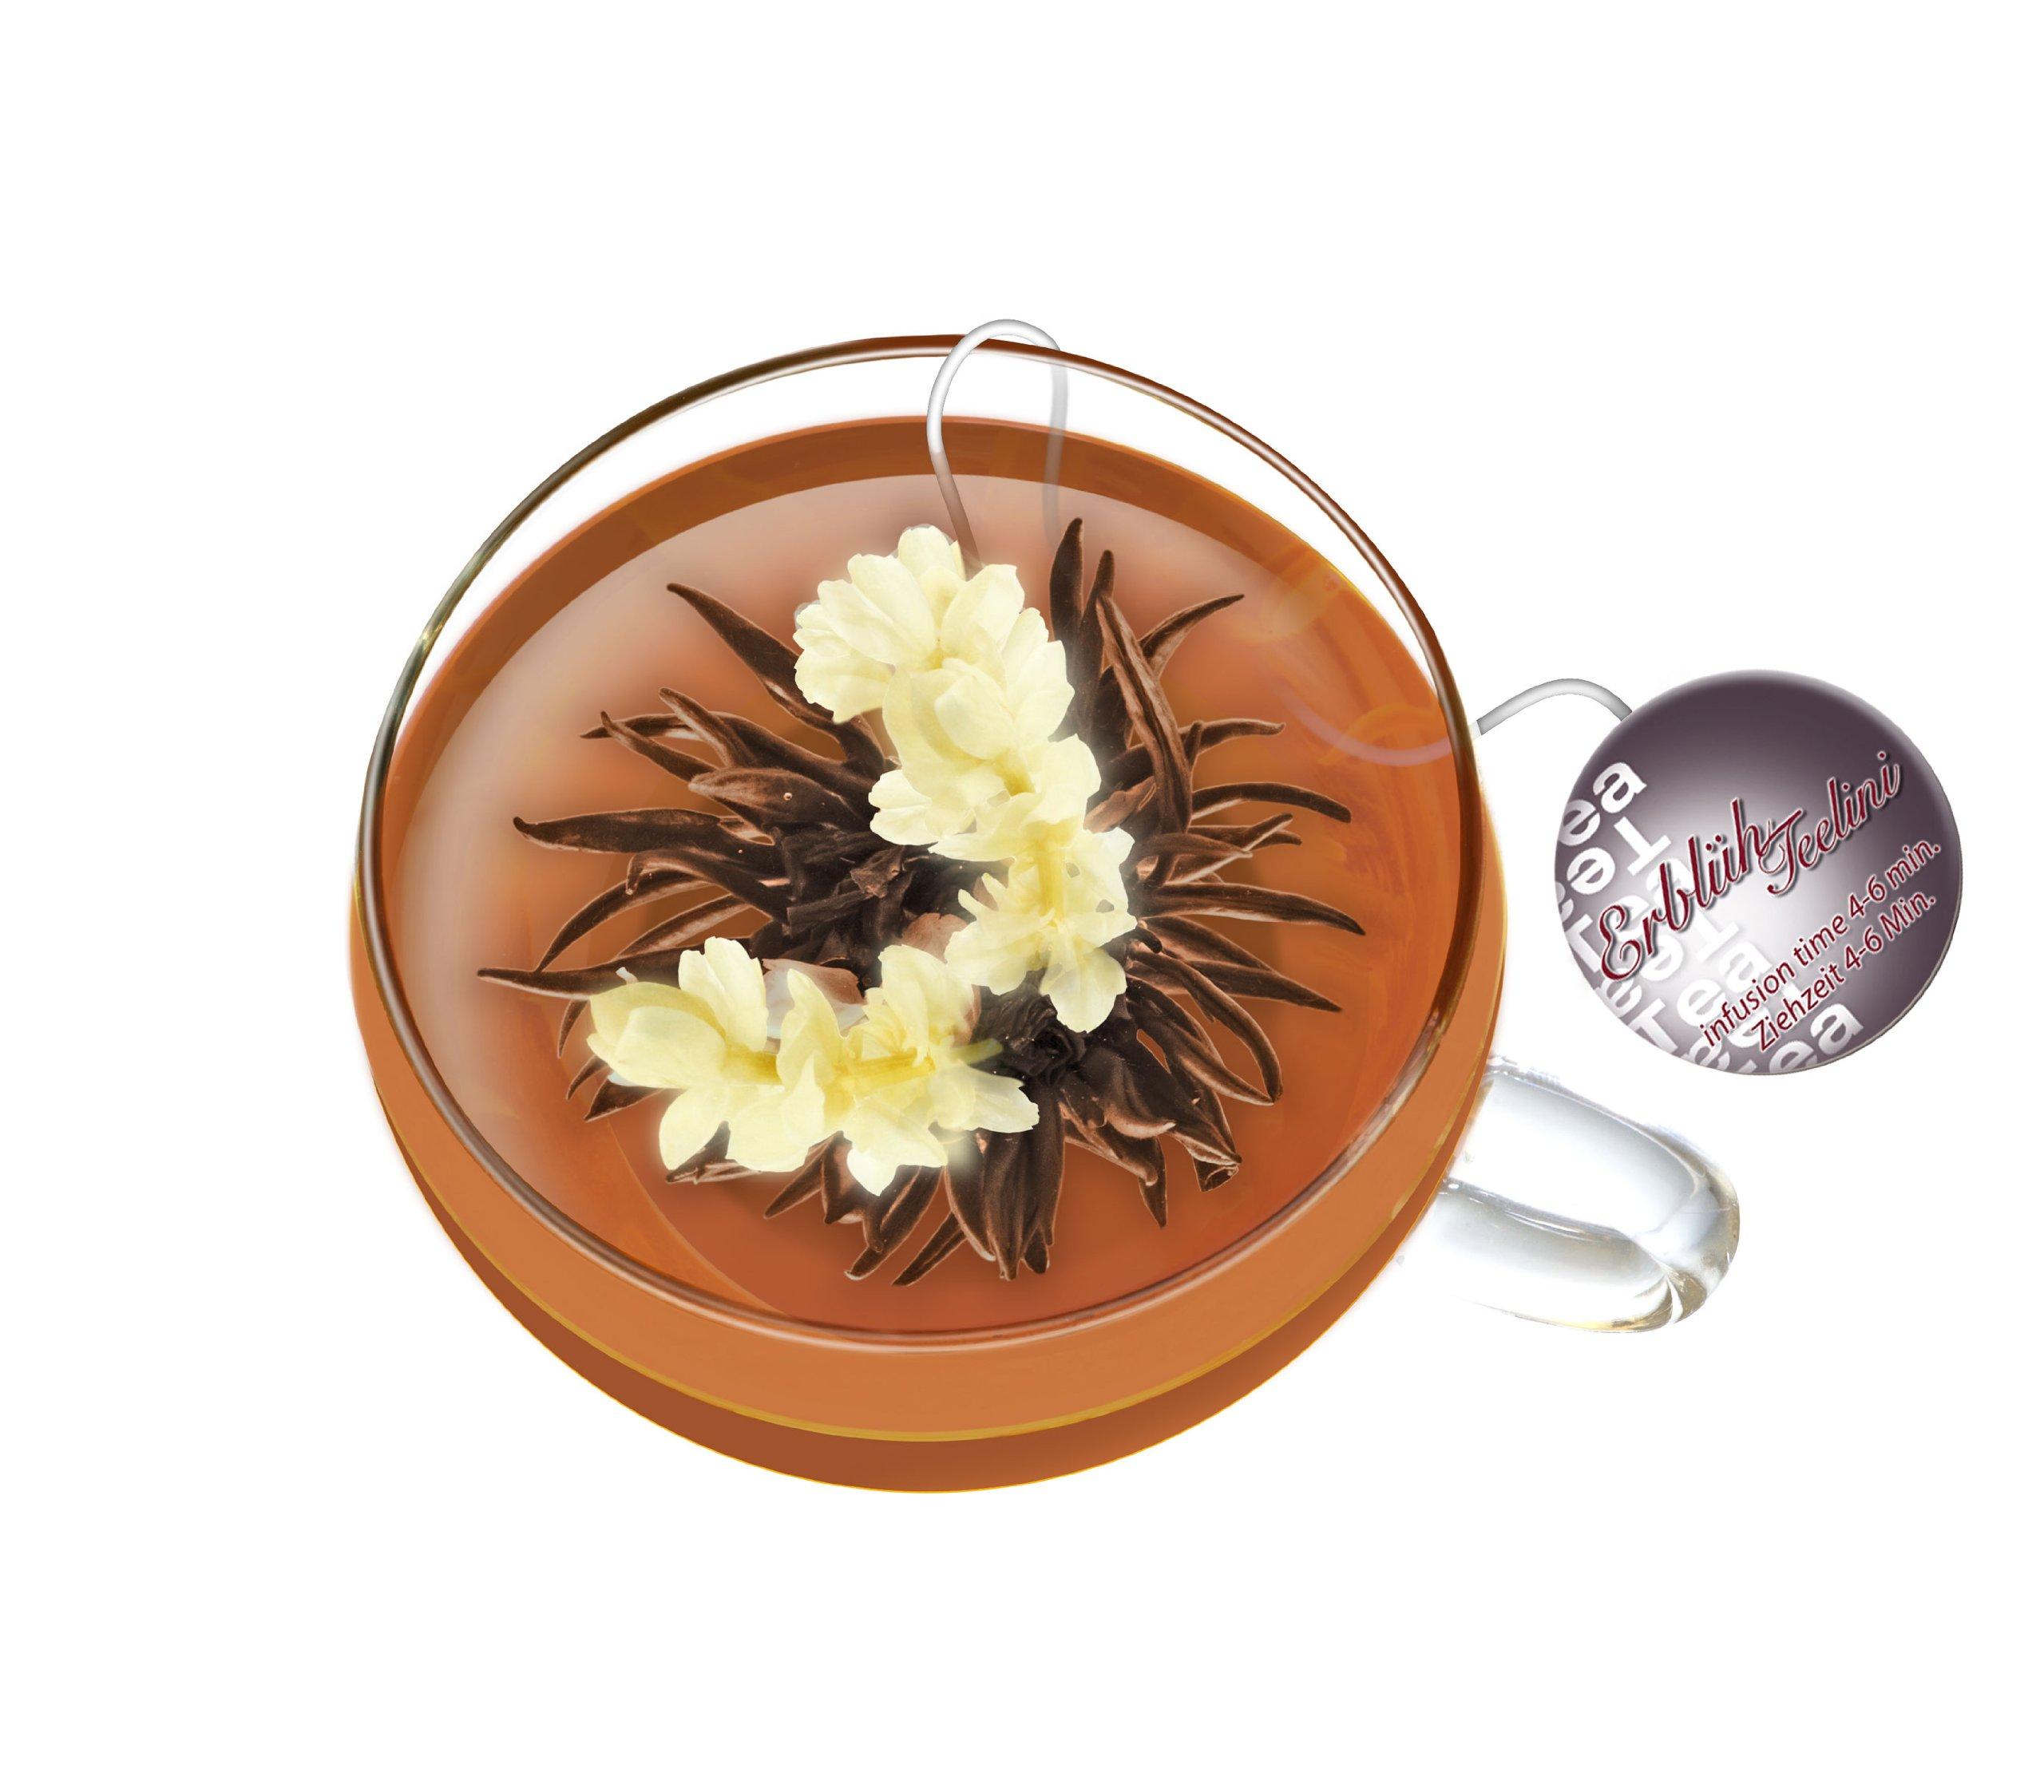 Creano-Teelini-Teeblumen-im-Tassenformat-Geschenkset-in-Teekiste-aus-Holz-12-ErblhTeelini-in-8-Sorten-Weier-Tee-Schwarzer-Tee